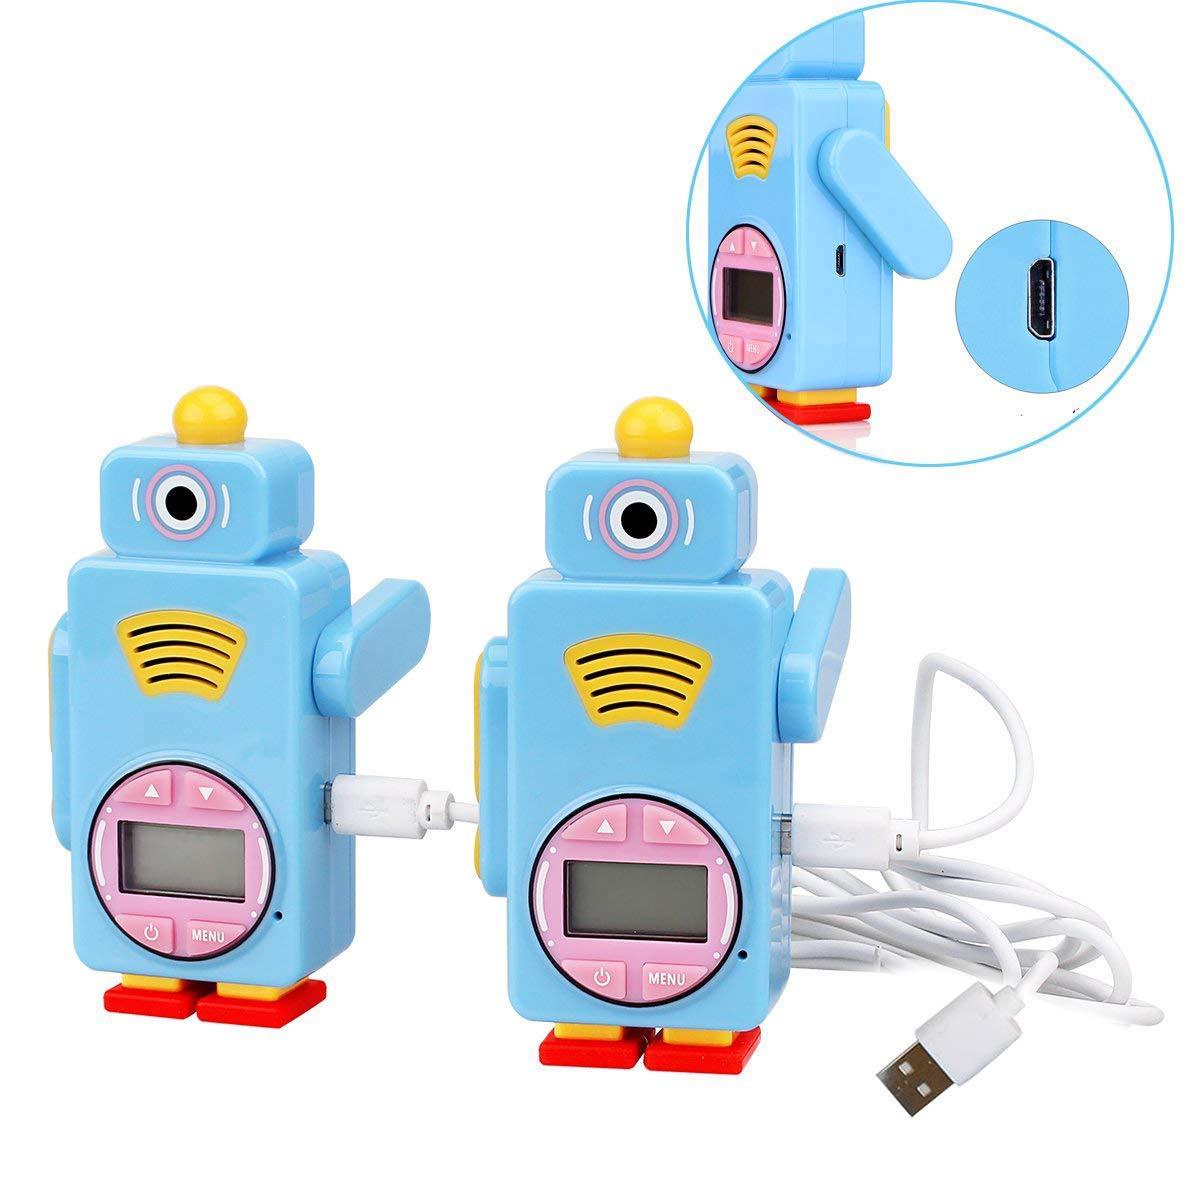 Retevis RT36 Kids Walkie Talkies Rechargeable Battery USB Charging Flashlight Long Range Crystal Sound License Free Walkie Talkies for Kids (Blue,2 Pack) by Retevis (Image #5)